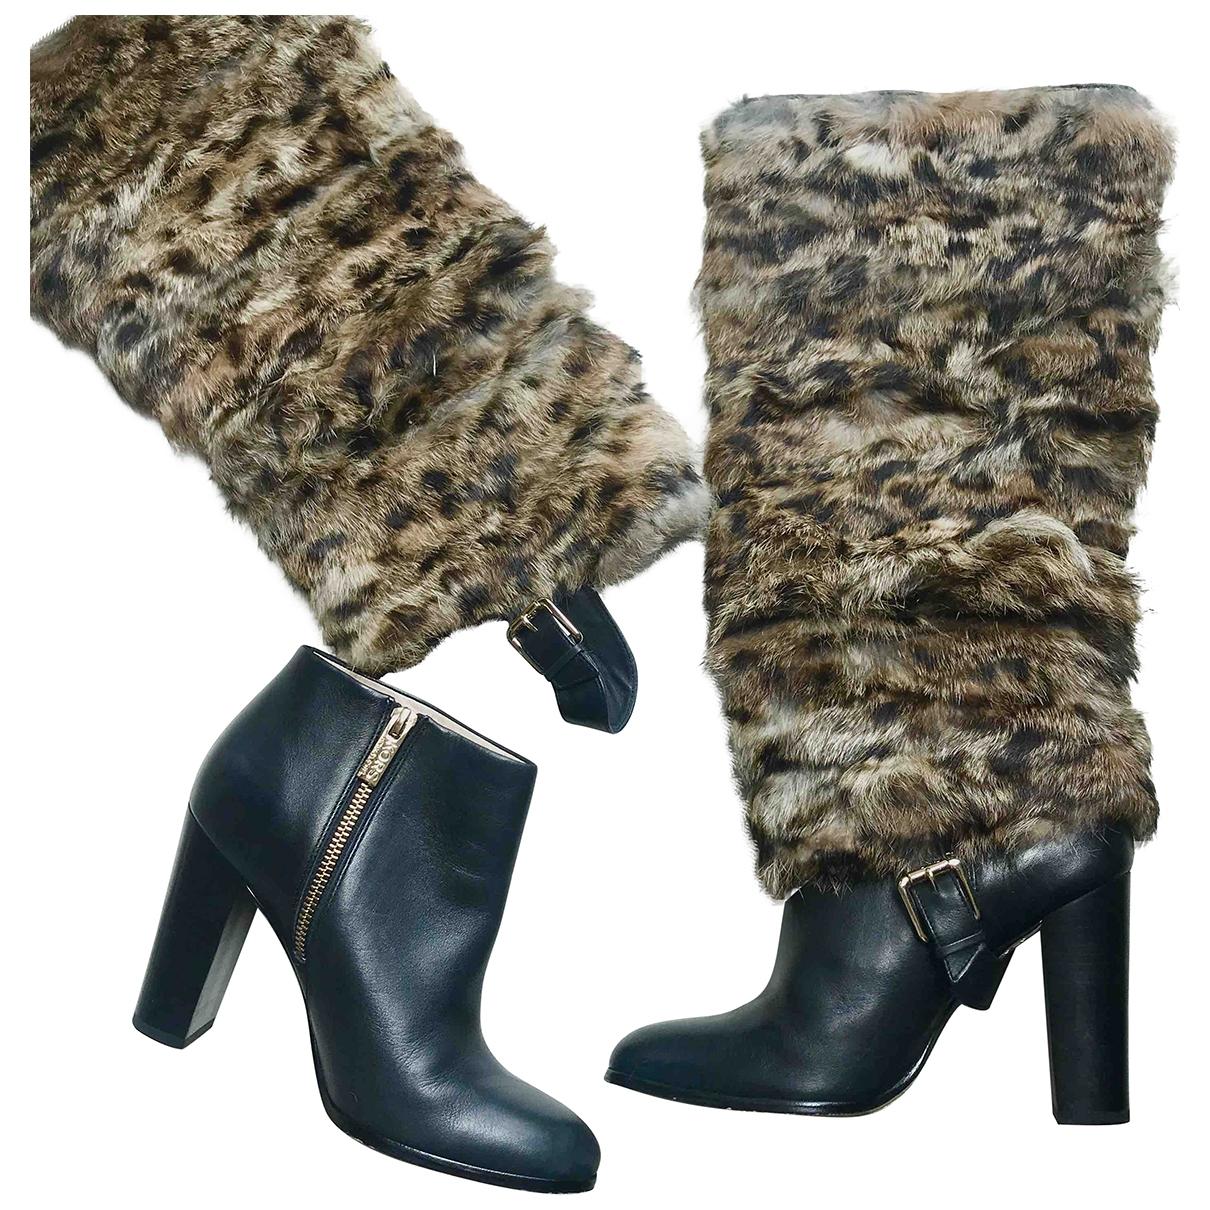 Michael Kors \N Multicolour Leather Boots for Women 37 EU